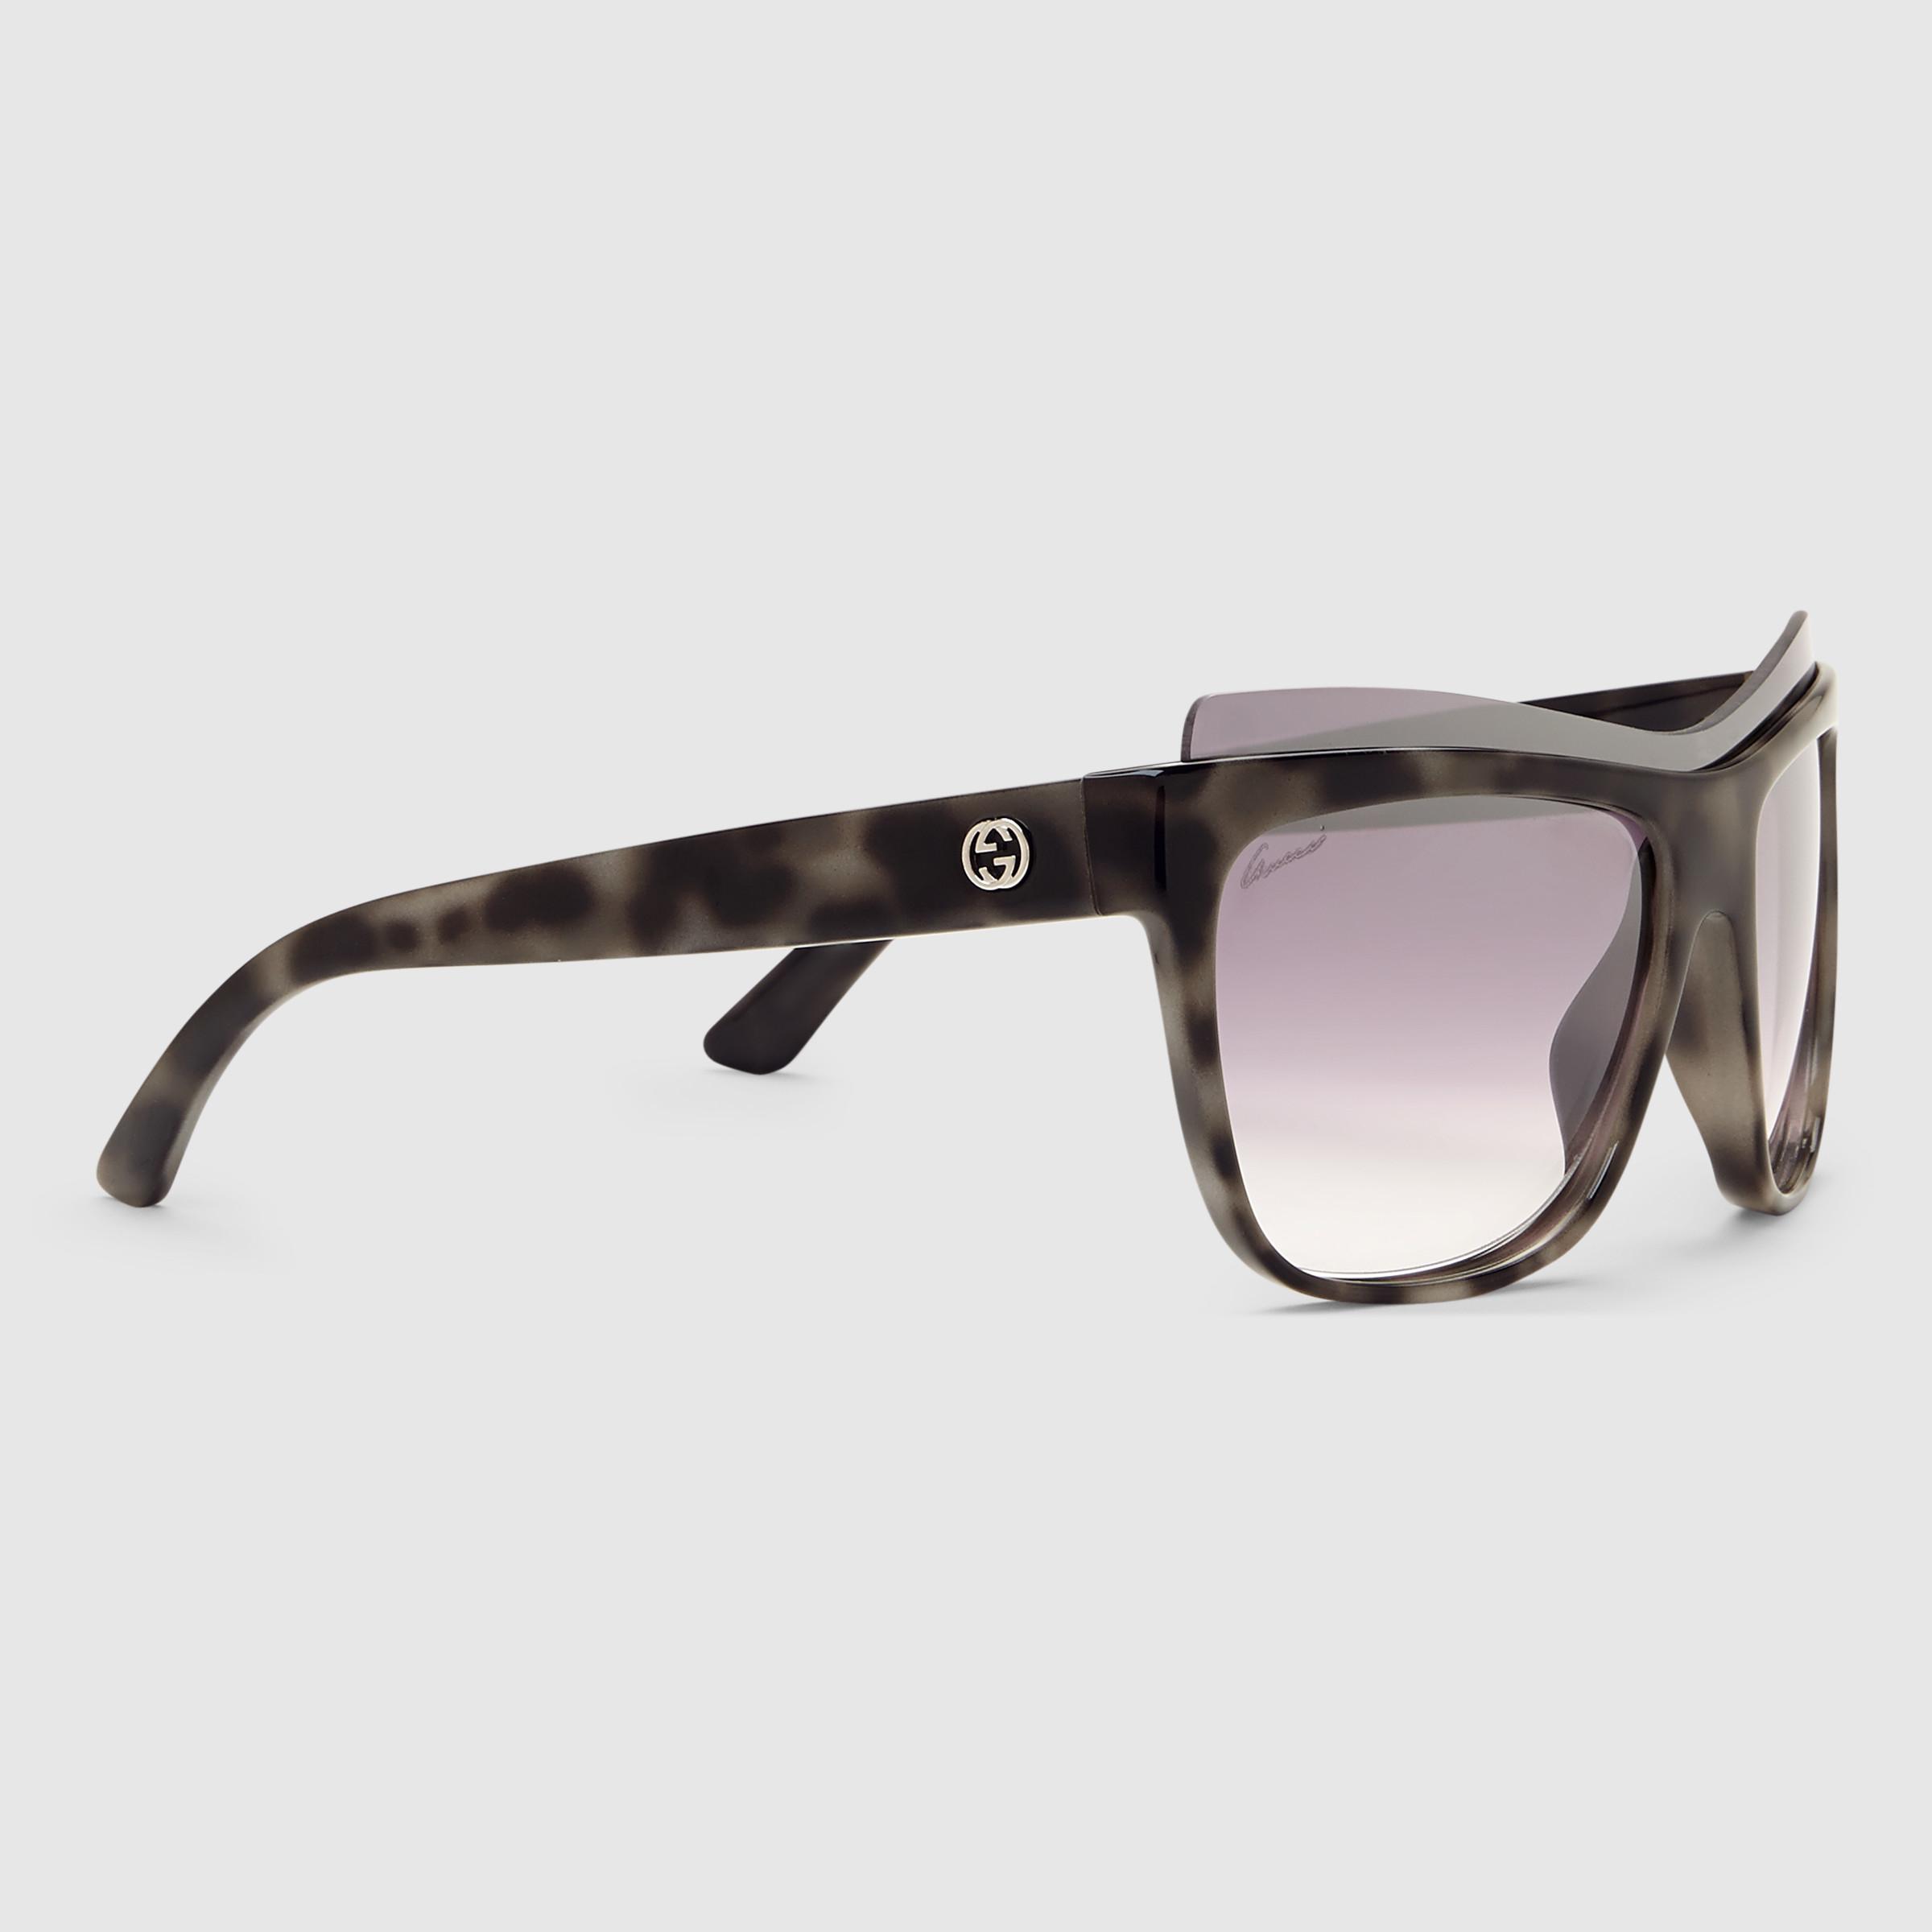 Gucci Wood Frame Glasses : Gucci Rectangular-frame Optyl Sunglasses Lyst